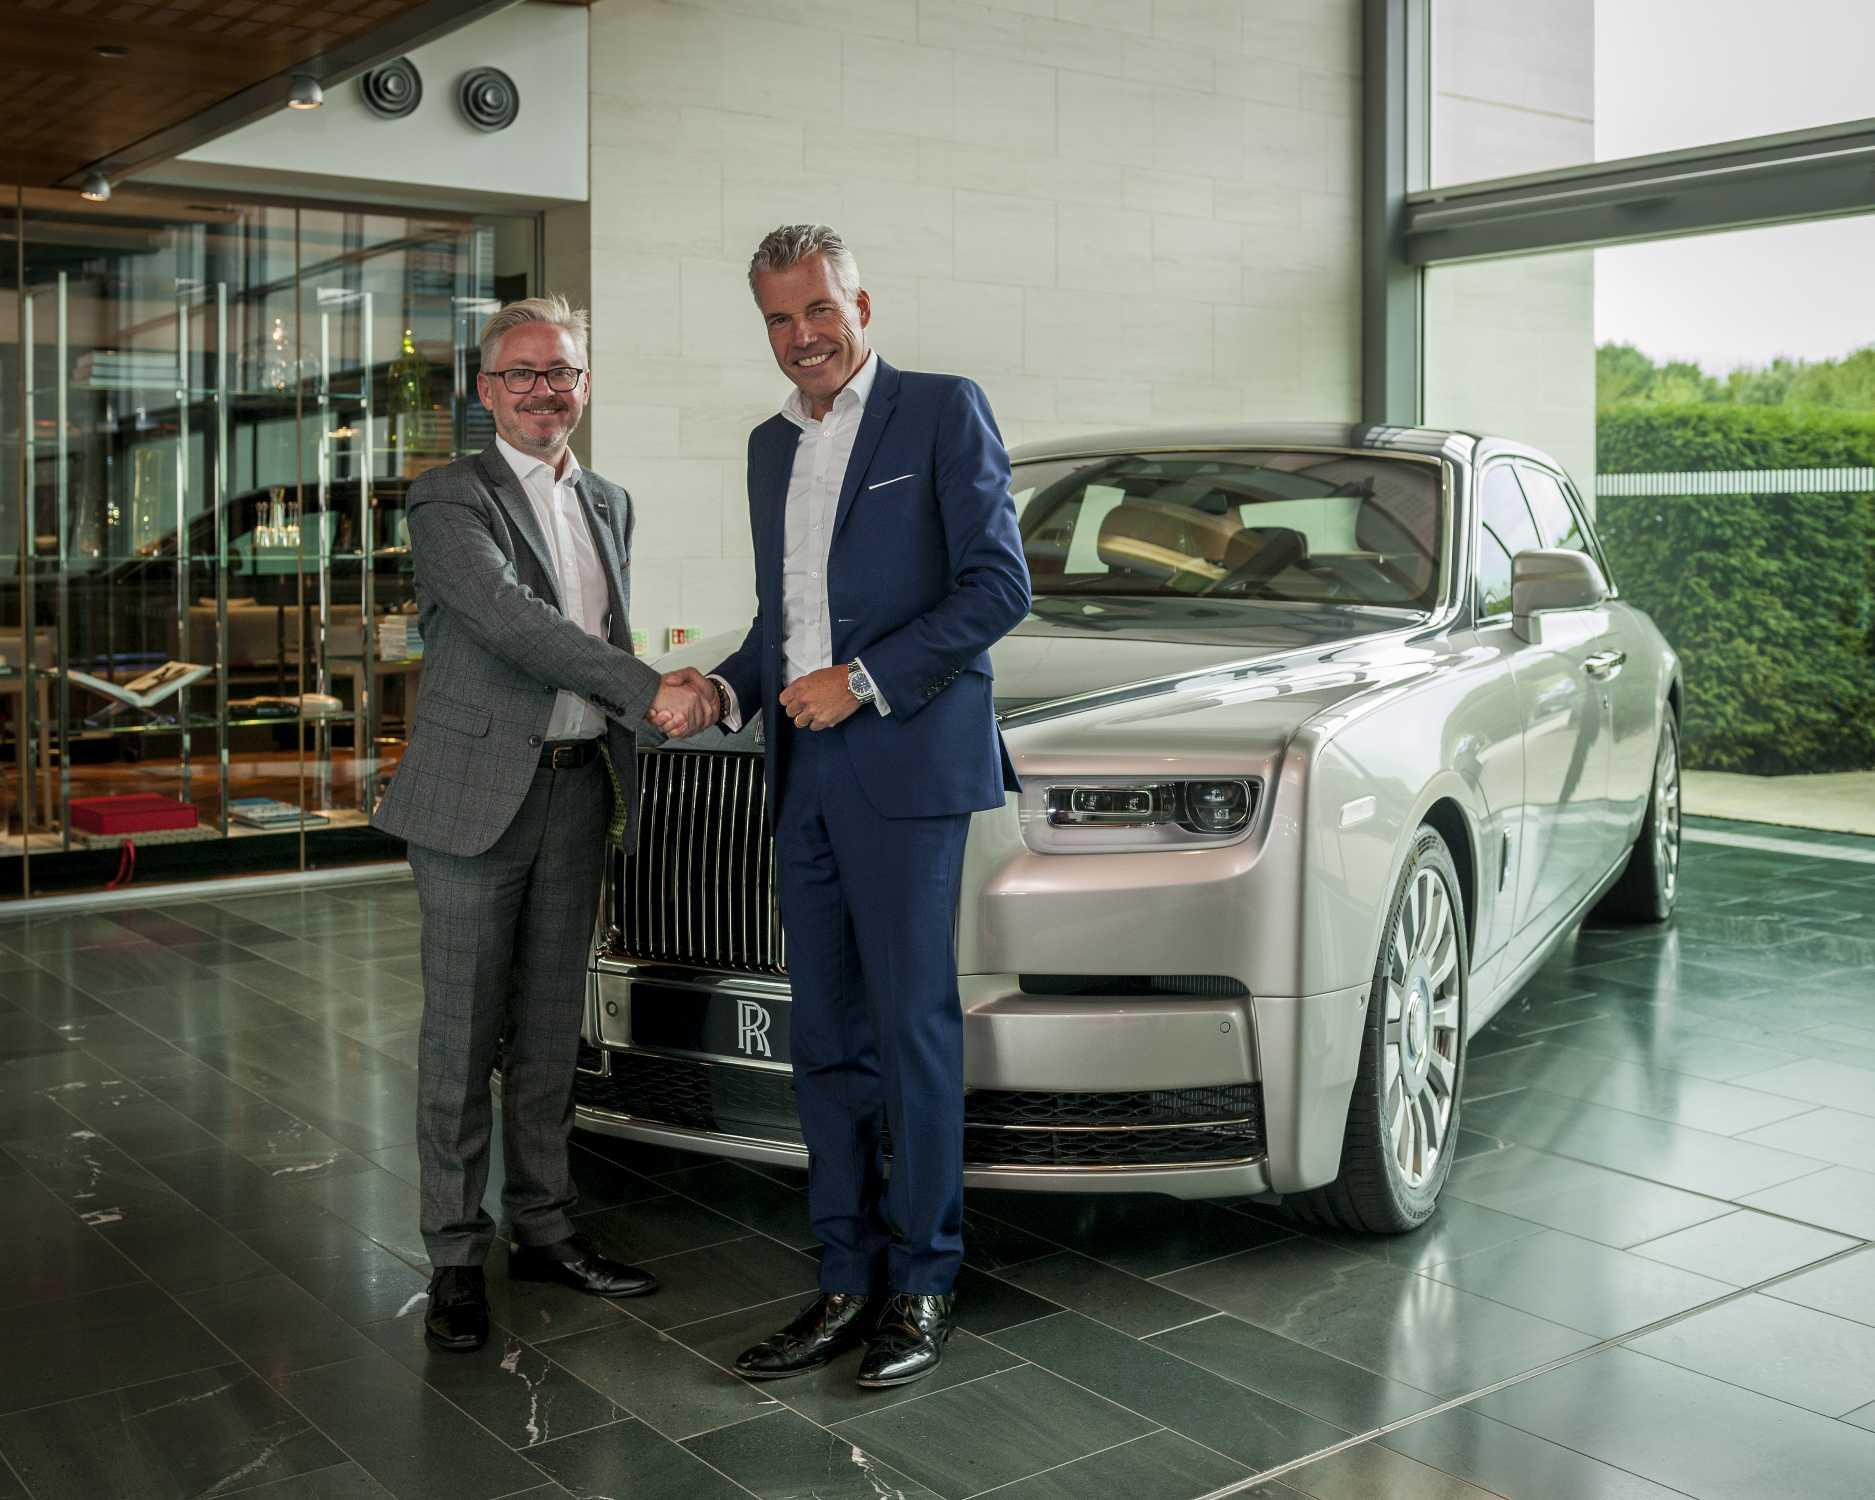 Rolls Royce Dealers >> Rolls Royce Motor Cars Announces Eighth Uk Showroom